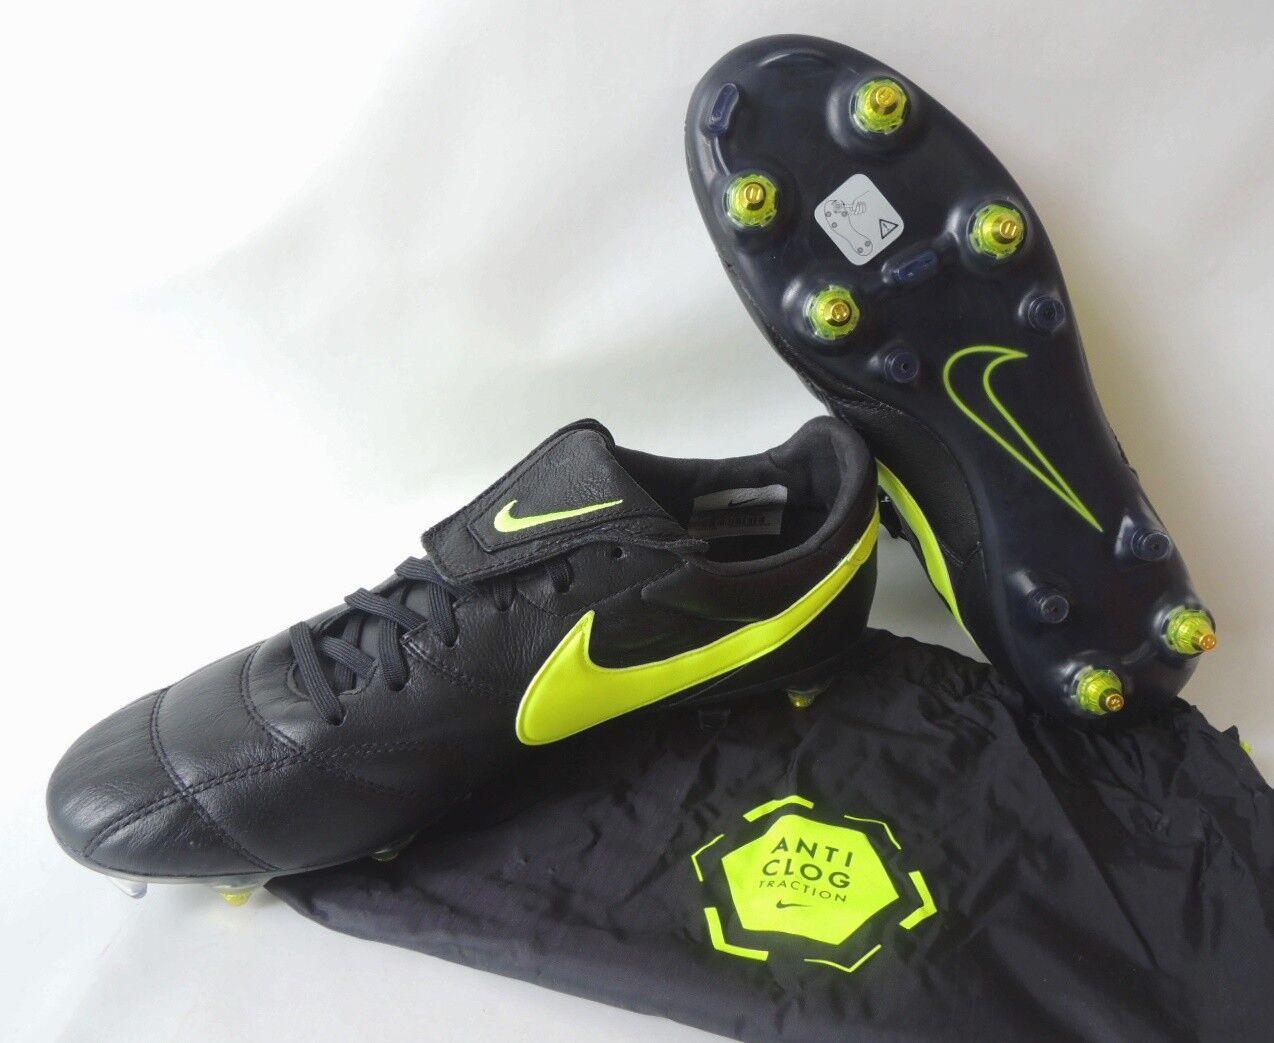 NEU Premier II Größe SG Pro AC Anti Clog Größe II 43 Leder Fußballschuhe 921397-001 d10ad1